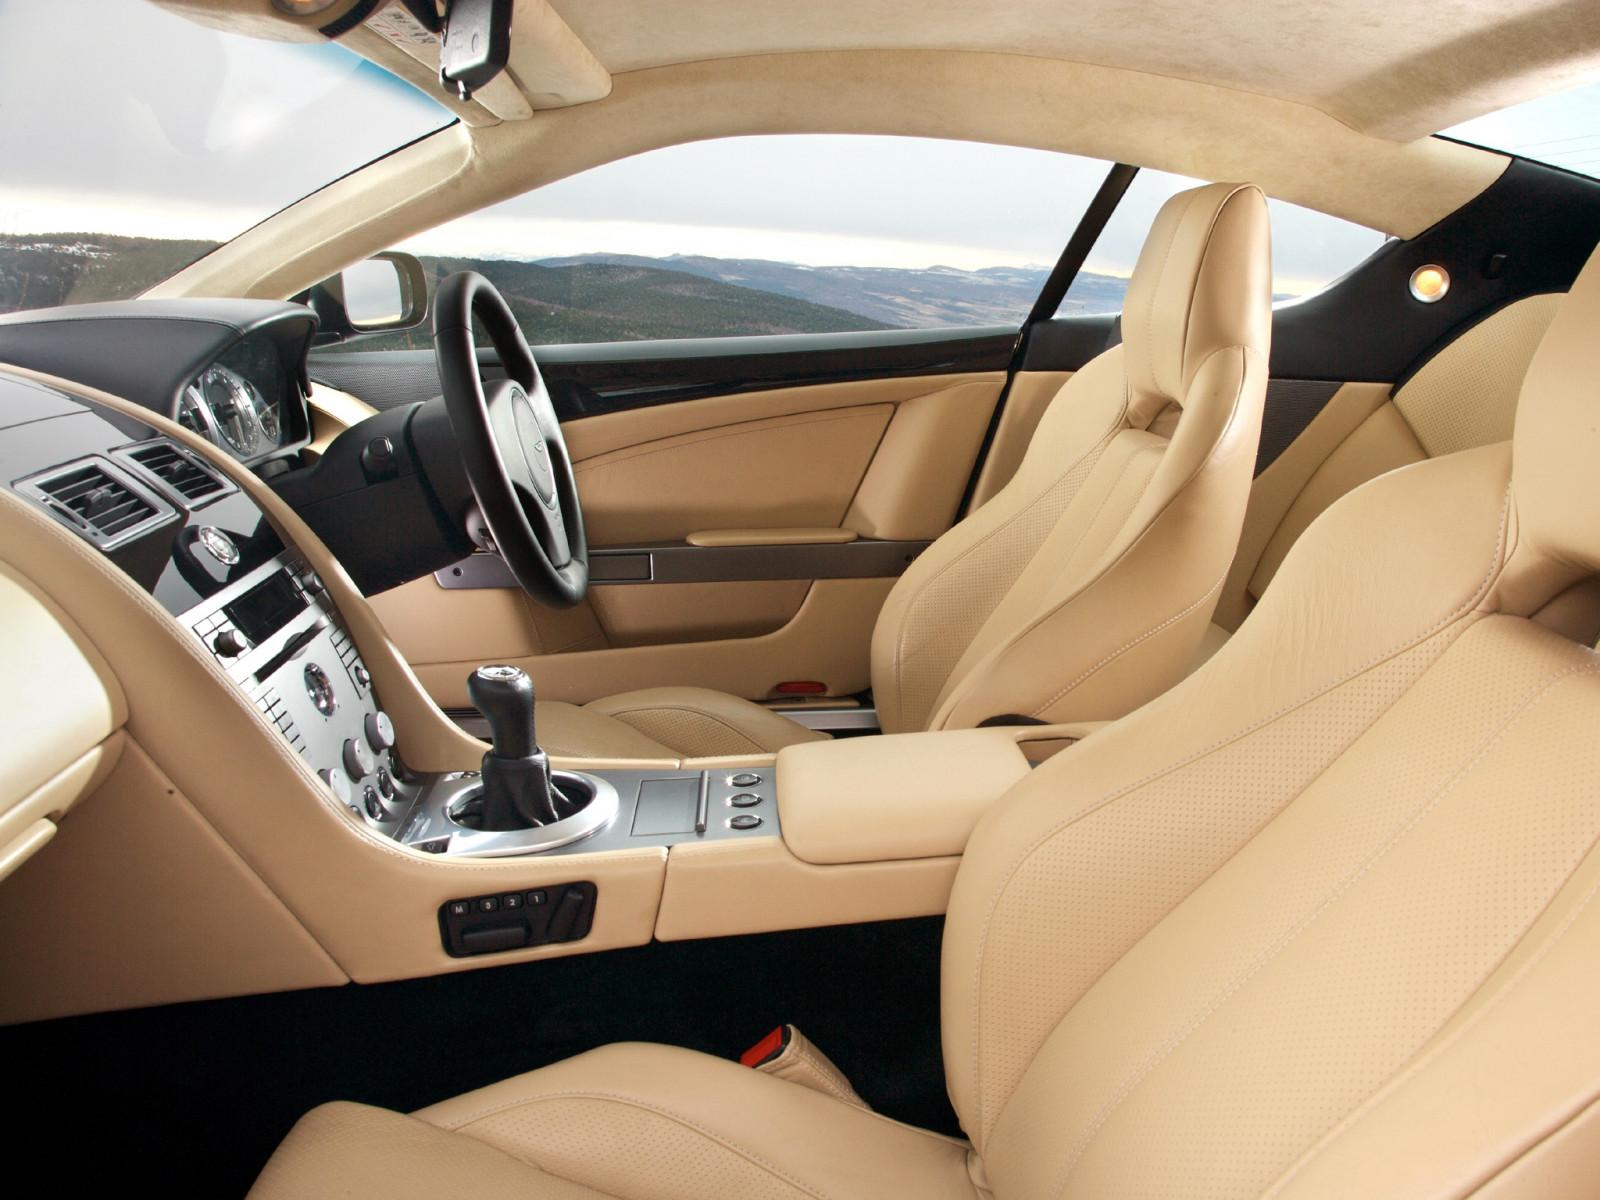 fond d 39 cran int rieur v hicule voiture de sport compteur de vitesse aston martin sedan. Black Bedroom Furniture Sets. Home Design Ideas